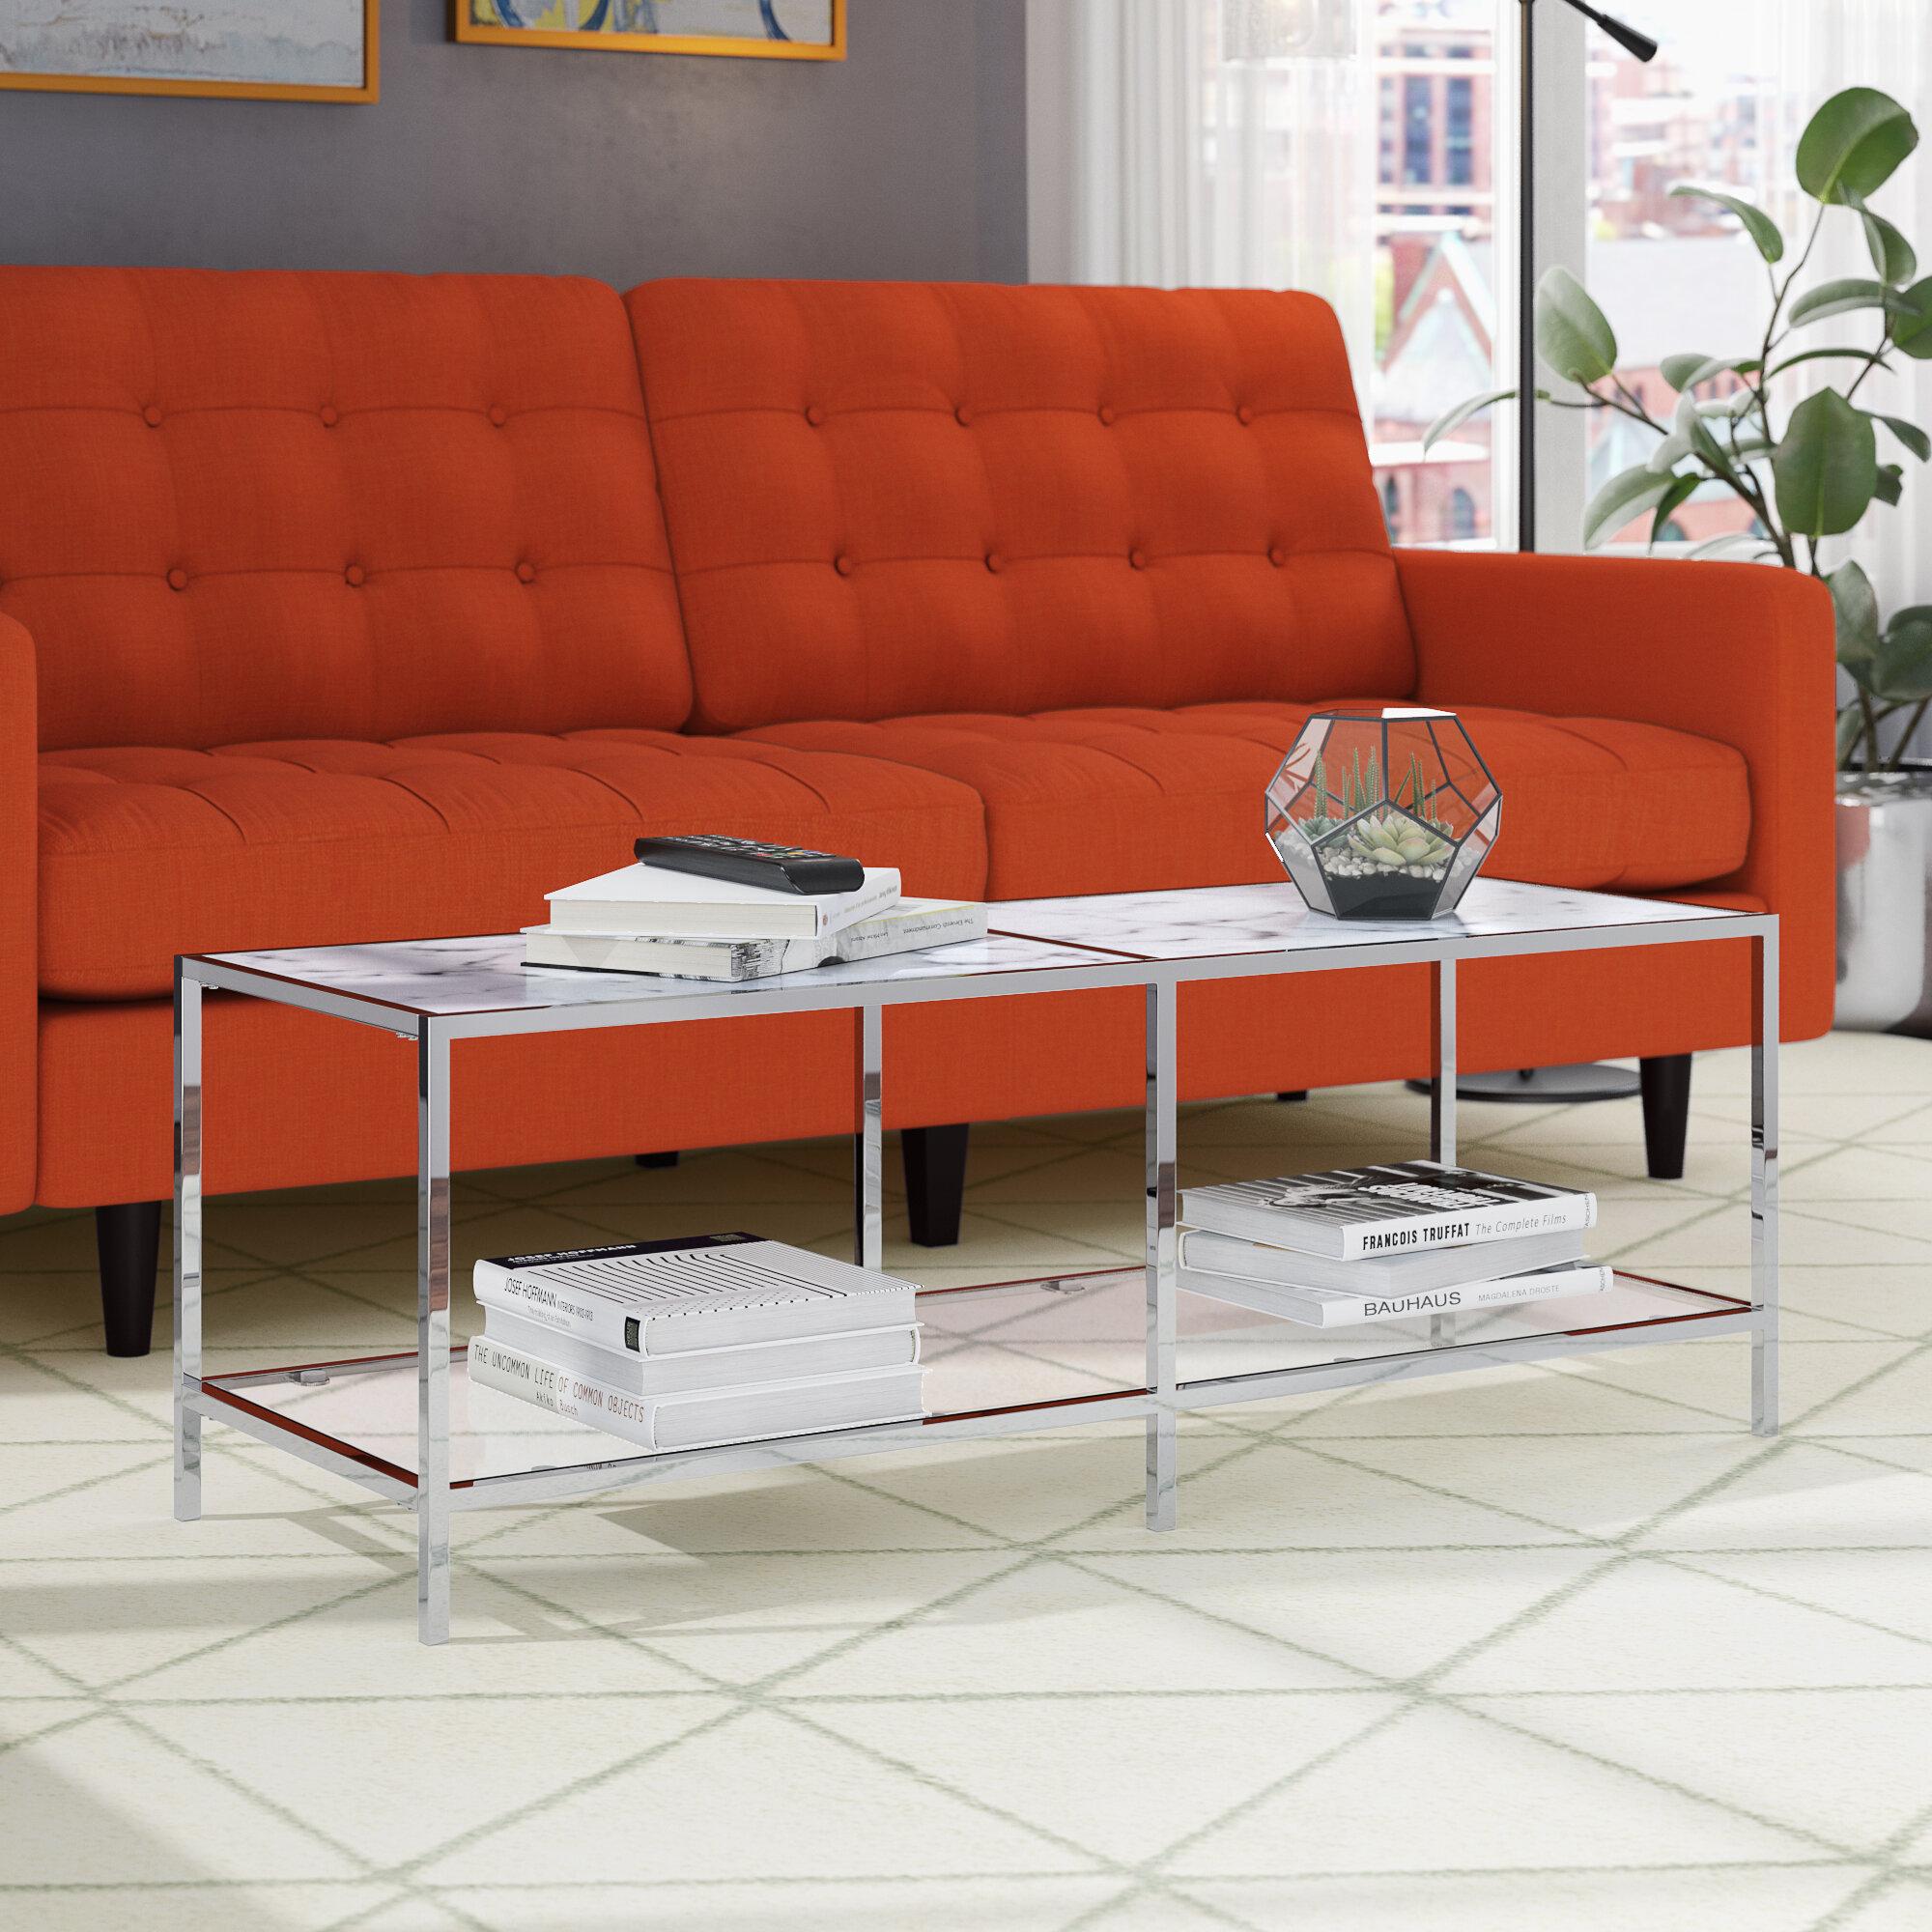 Peachy Mcdaniels Coffee Table Short Links Chair Design For Home Short Linksinfo